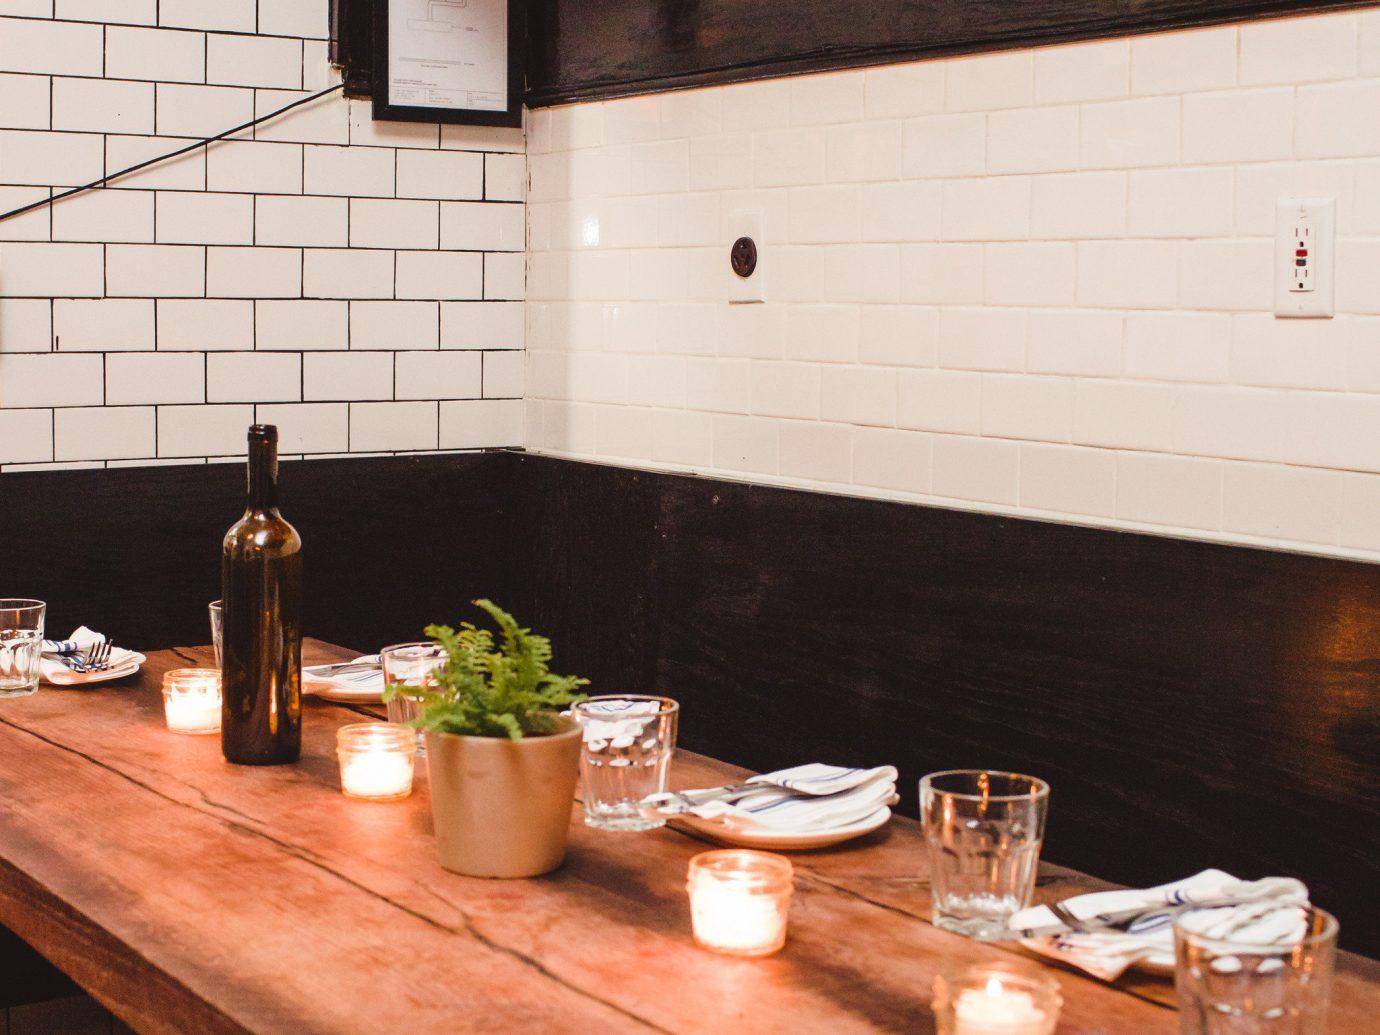 Brooklyn City Food + Drink NYC countertop table interior design Kitchen furniture flooring